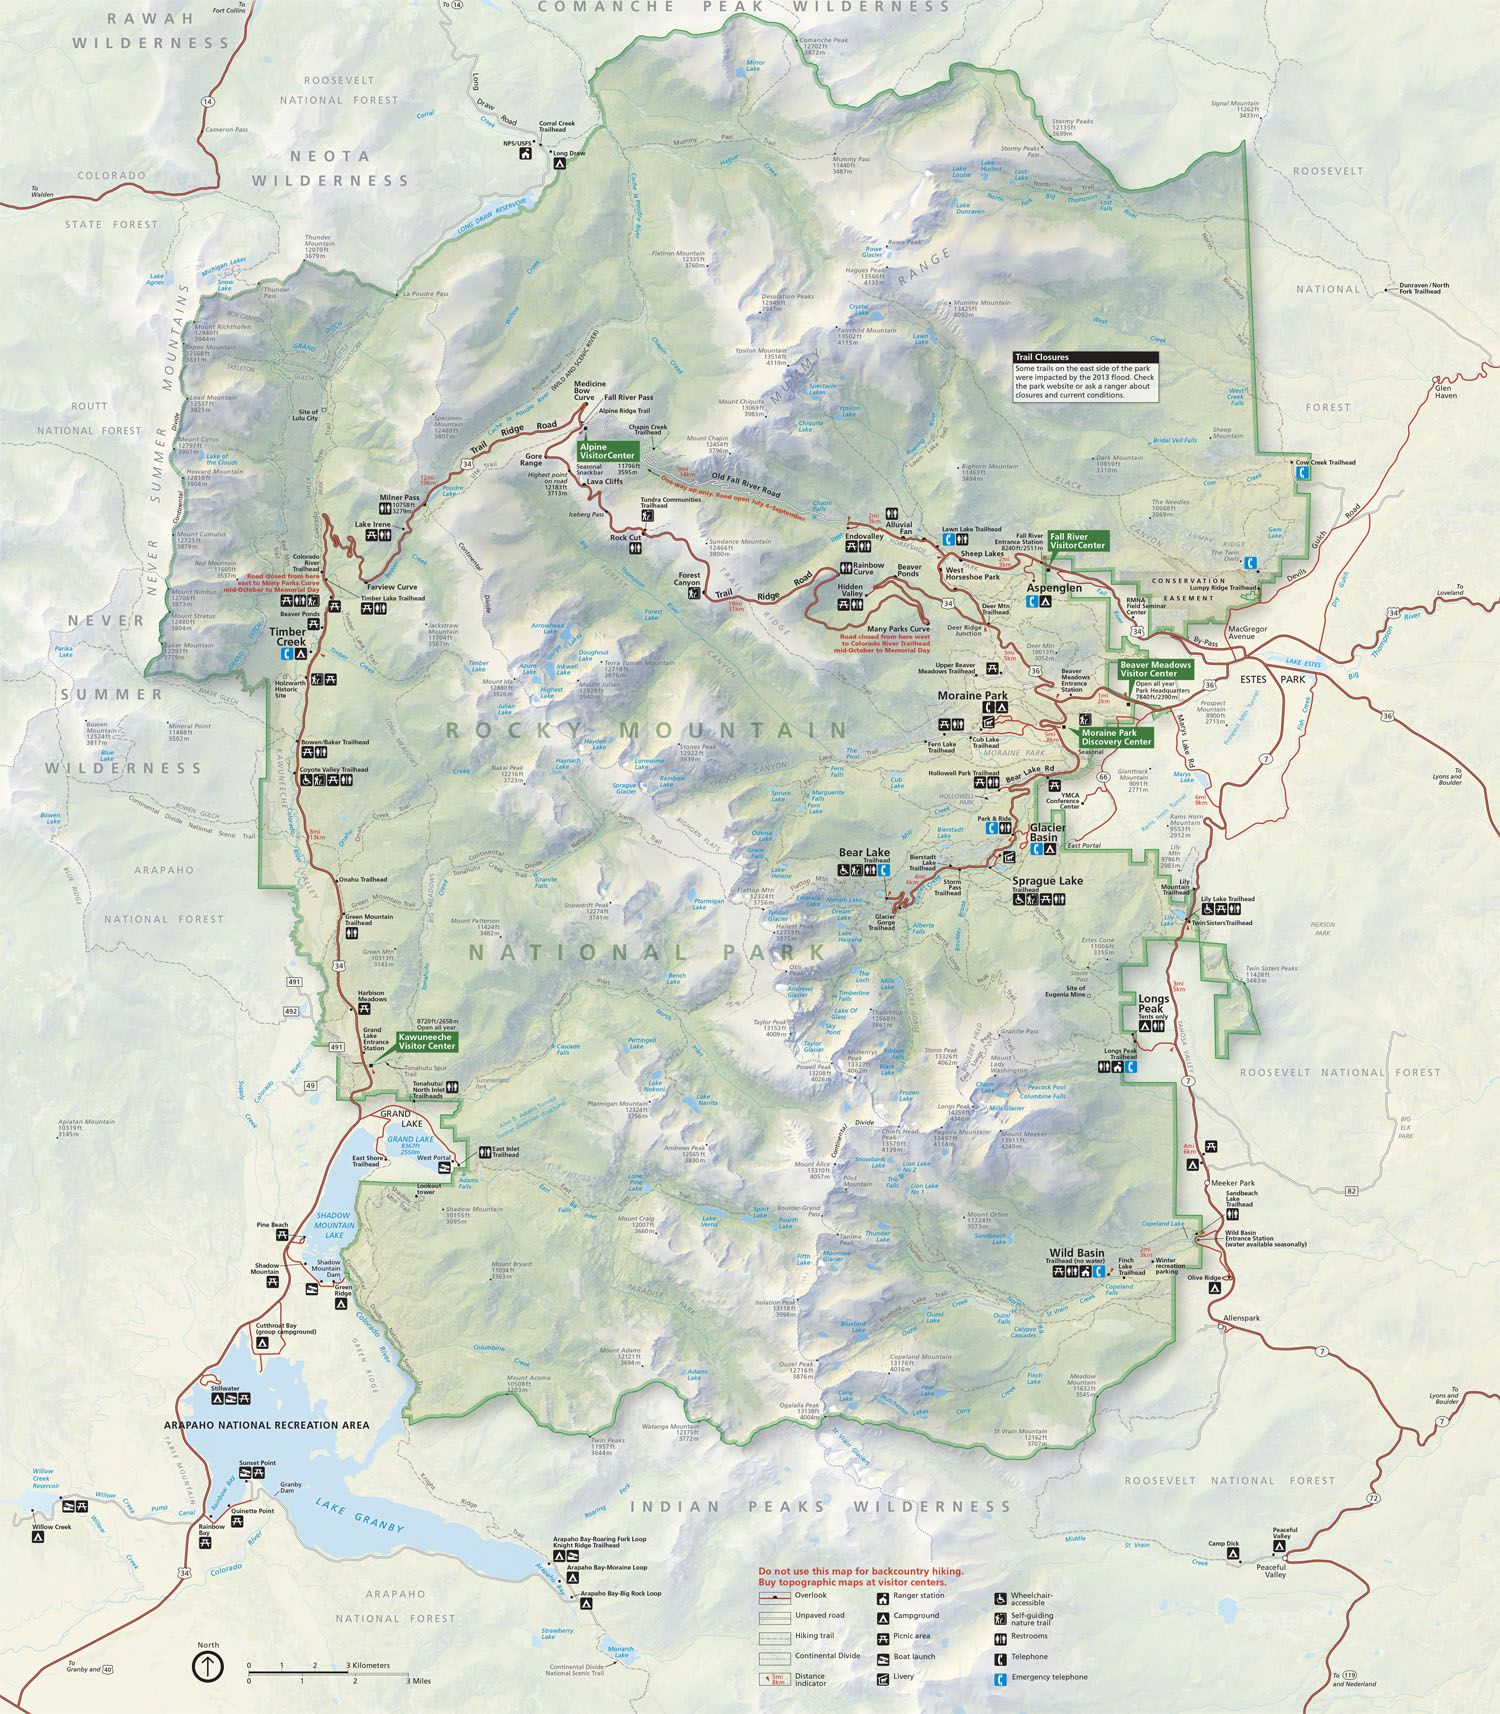 Map of RMNP